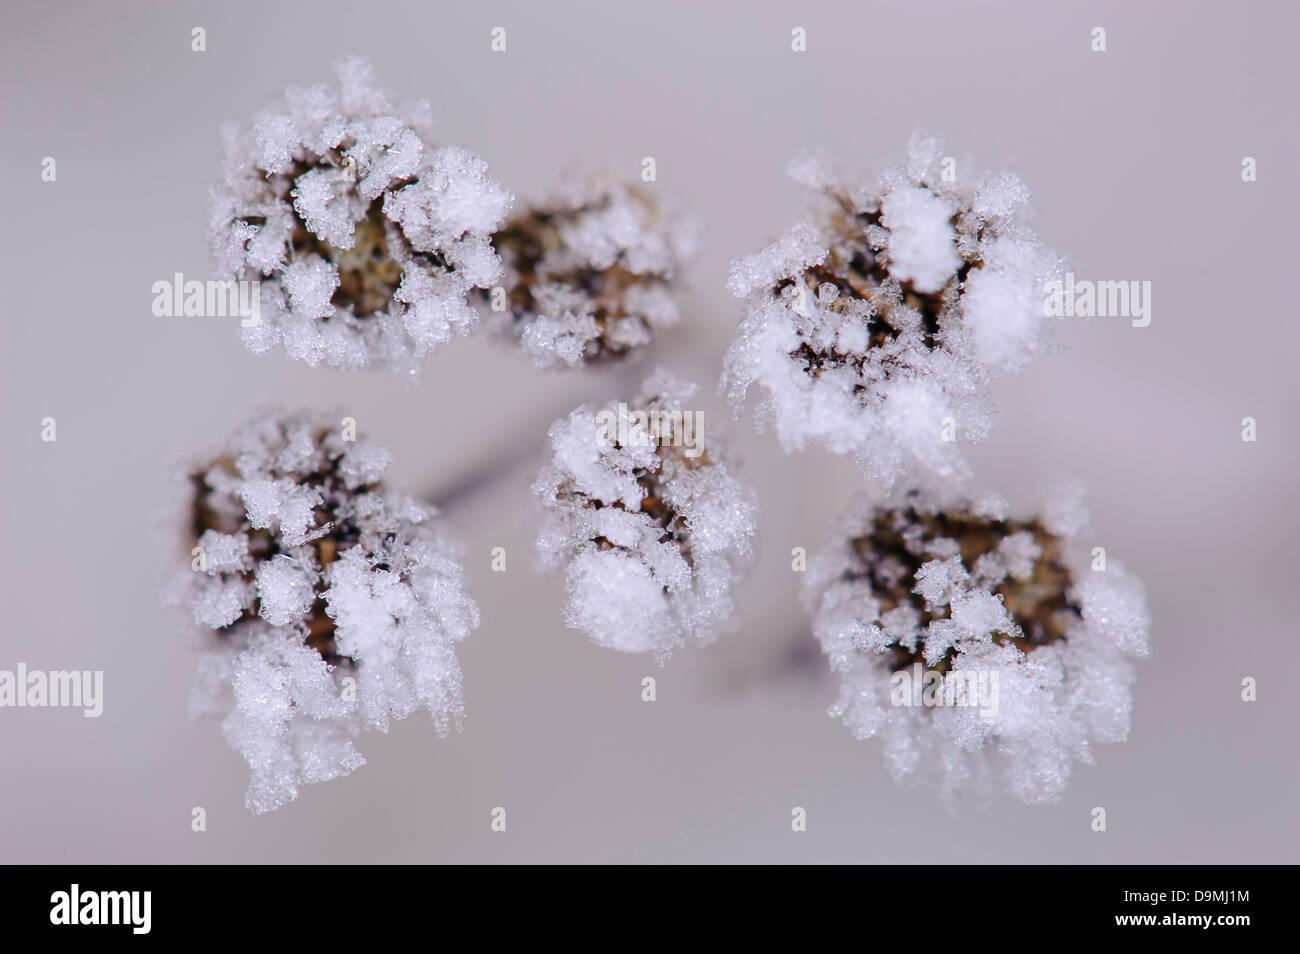 Ice ice-crystals form margin fern Syn.: Chrysanthemum vulgare Tanacetum vulgare water winter - Stock Image